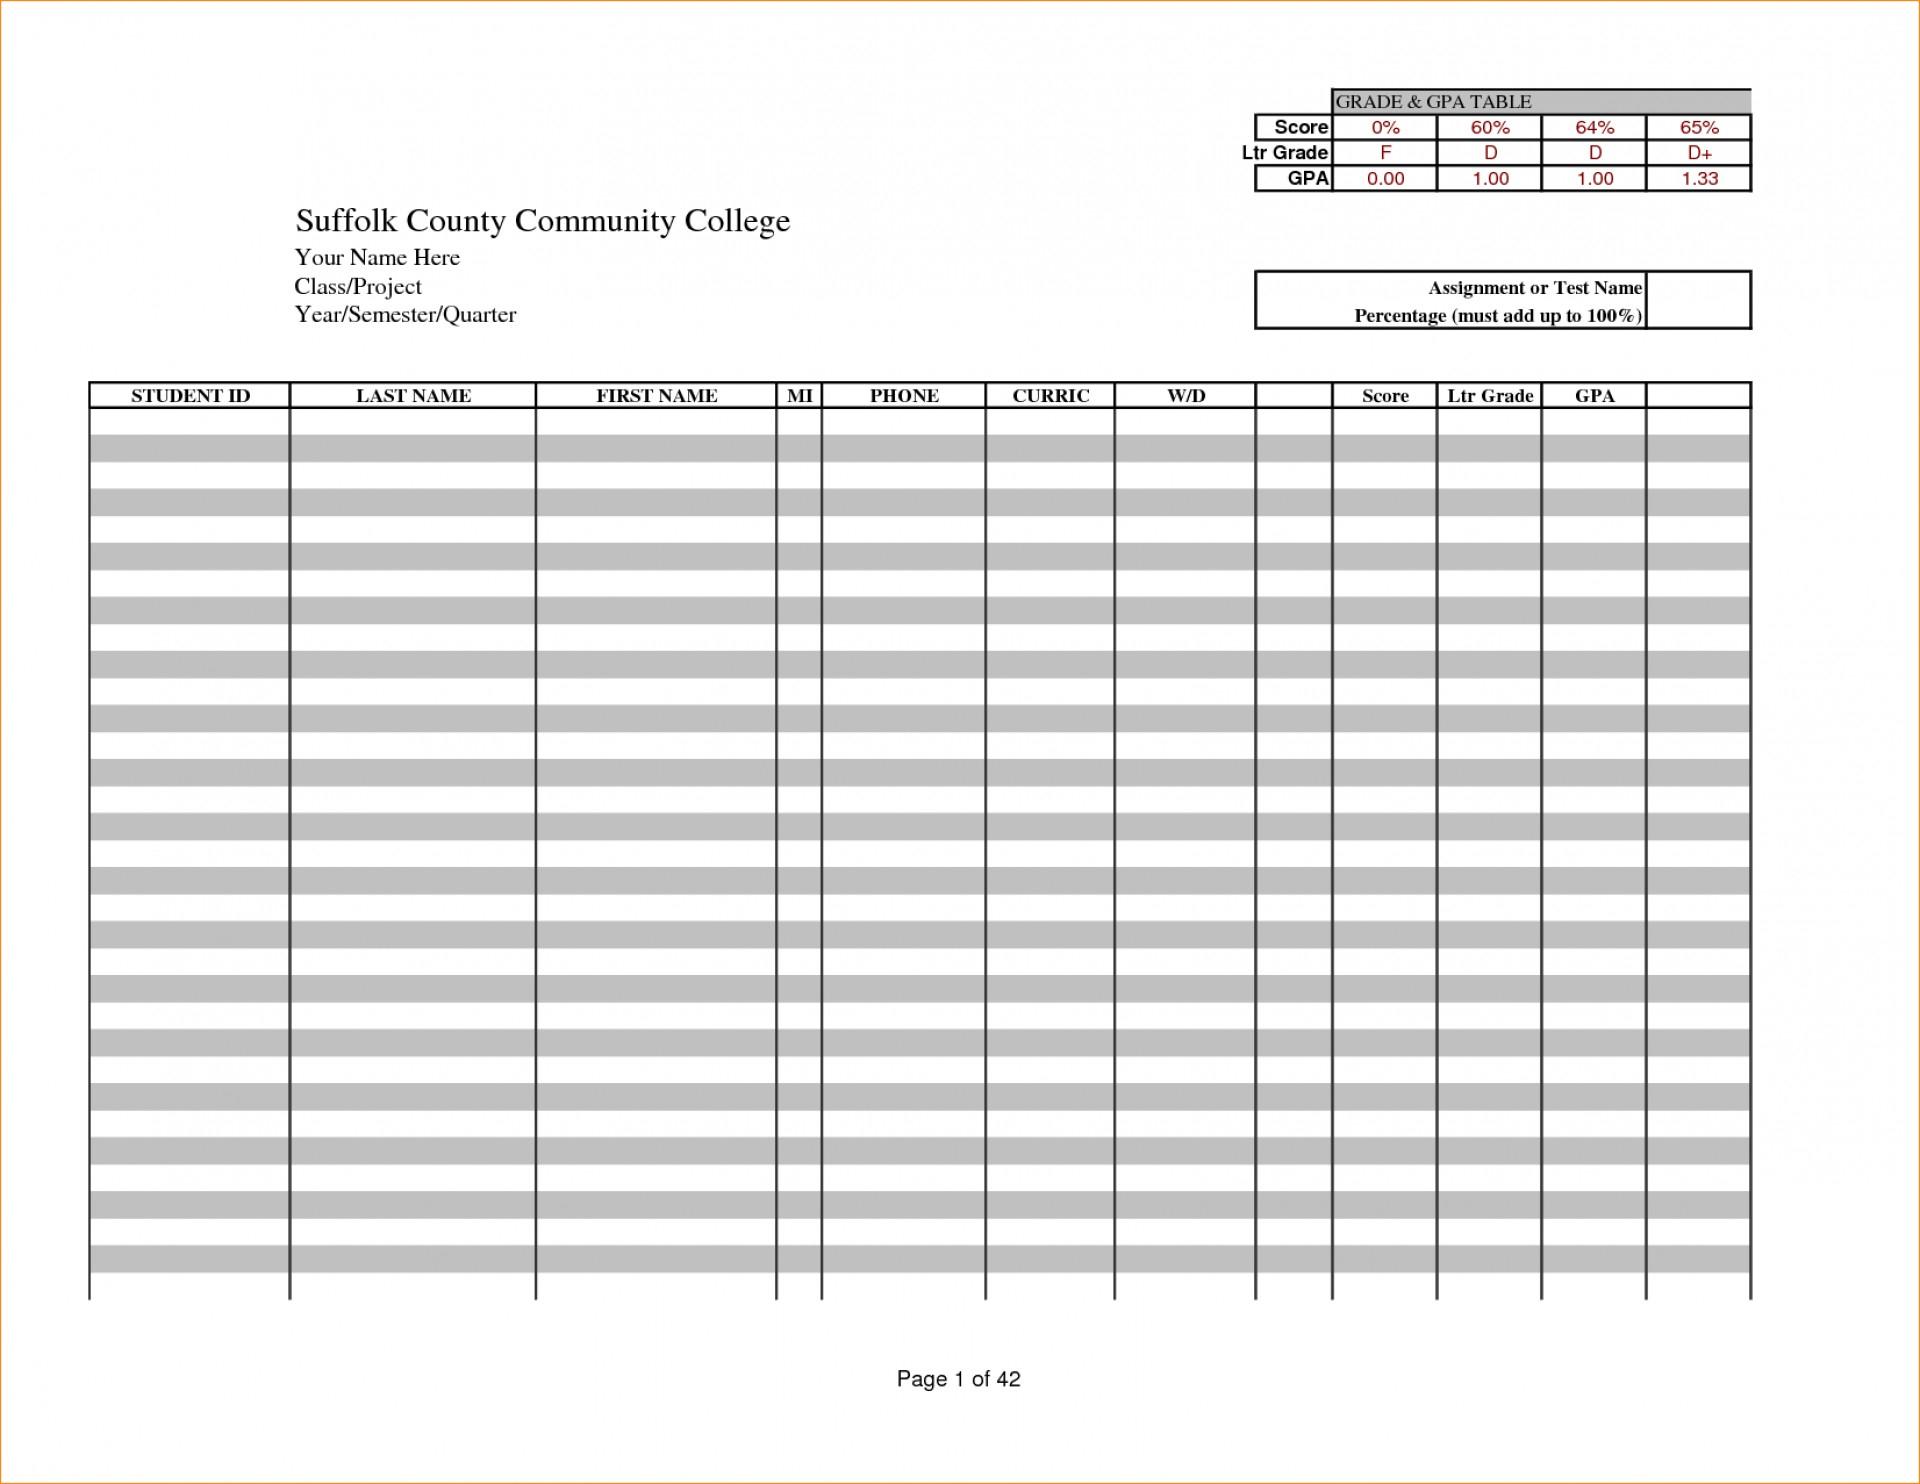 025 Teacher Grade Book Template Ideas Free Excel Gradebook 3605 - Free Printable Gradebook